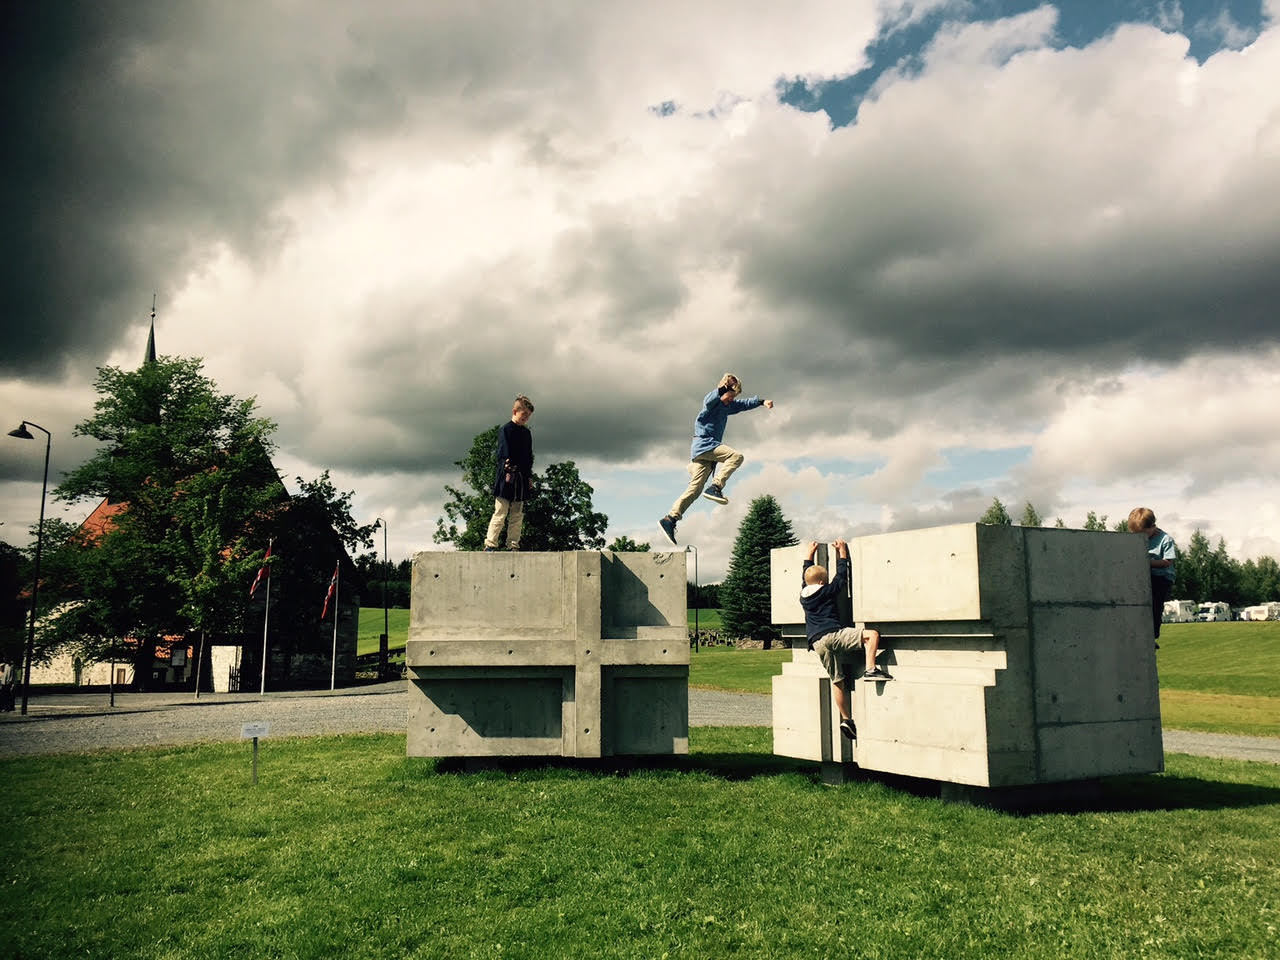 Installation at Stiklestad Nasjonale Kultursenter Battlefield in Norway, 2015